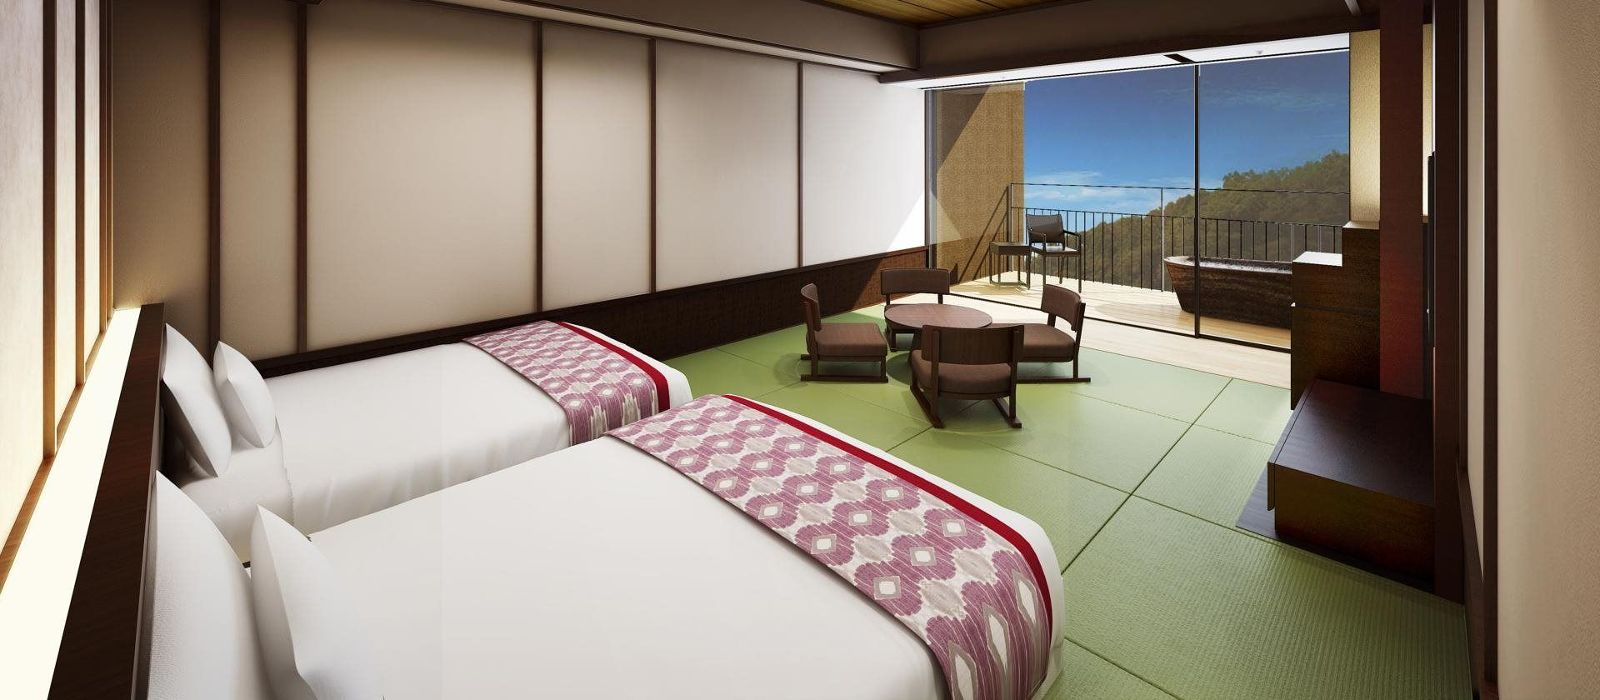 Hotel Hakone Kowakien Tenyu Japan